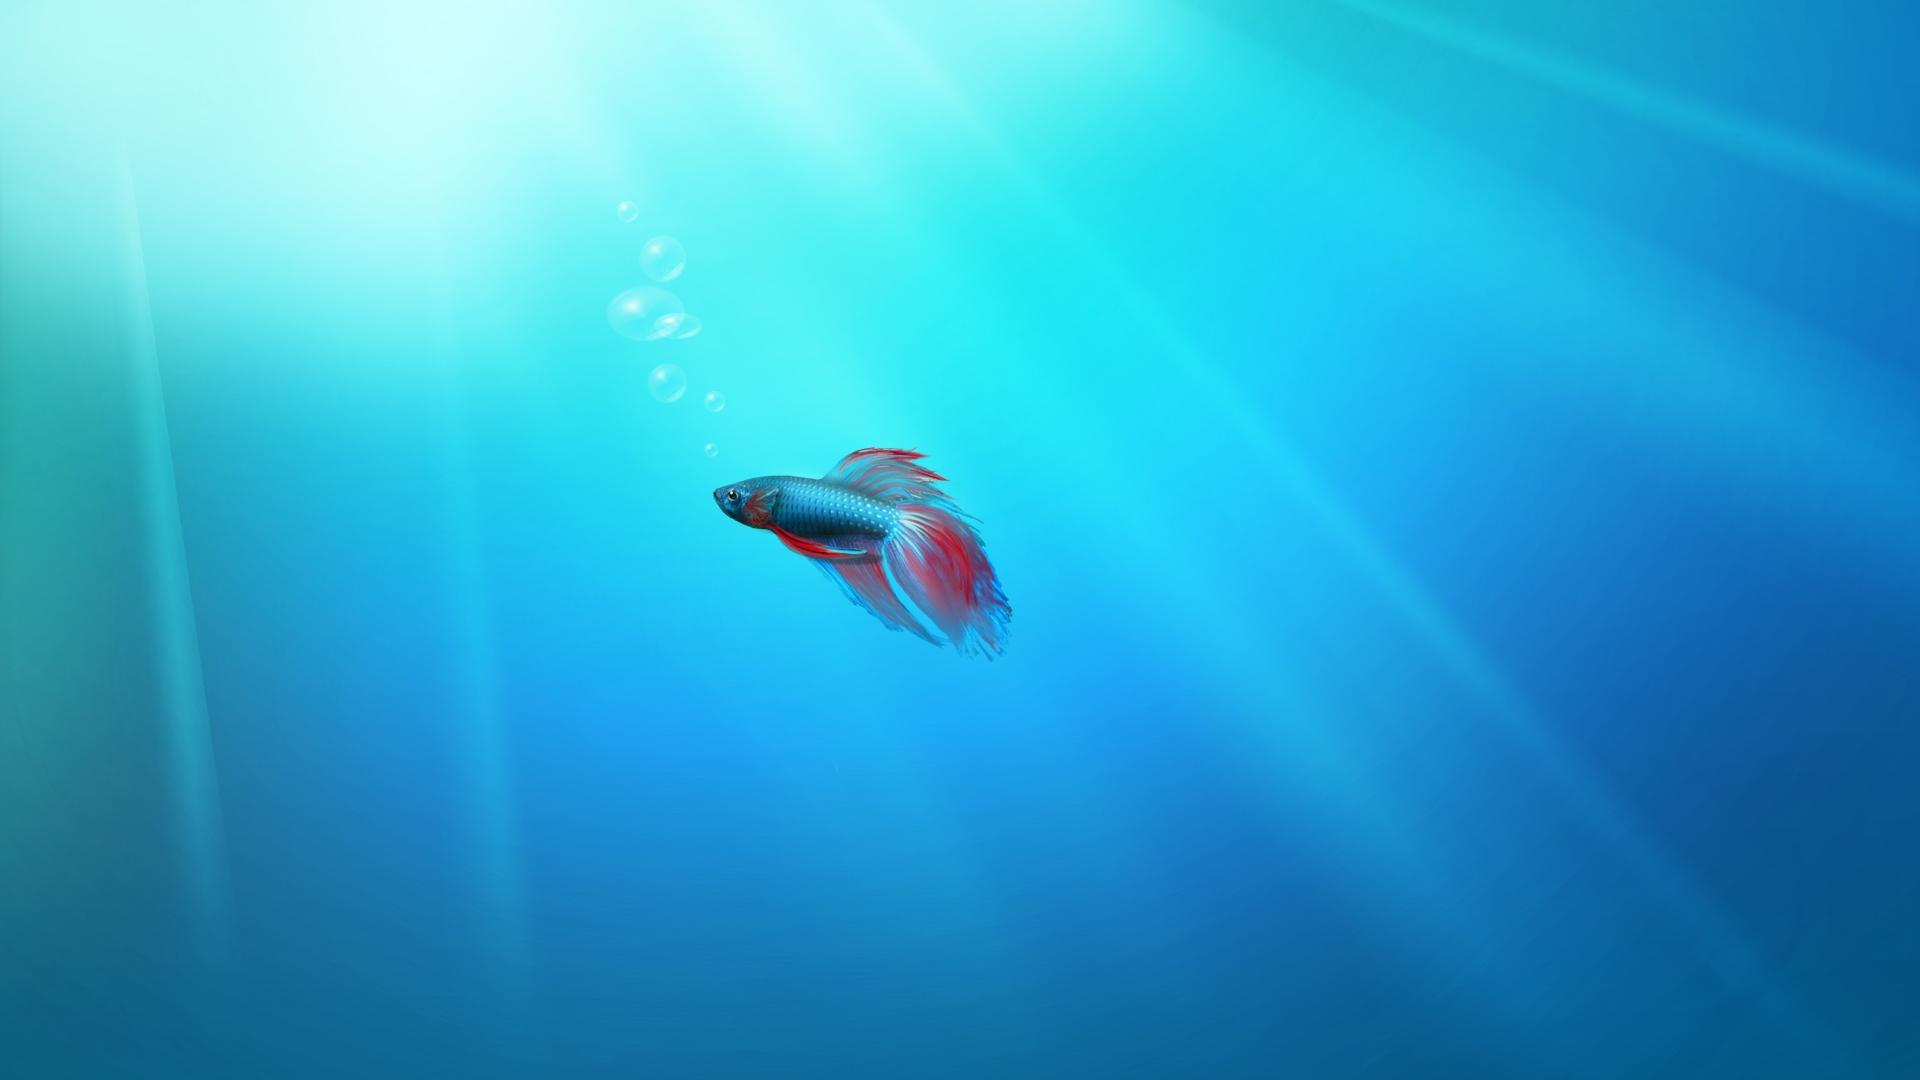 Windows 7 Fish Wallpaper